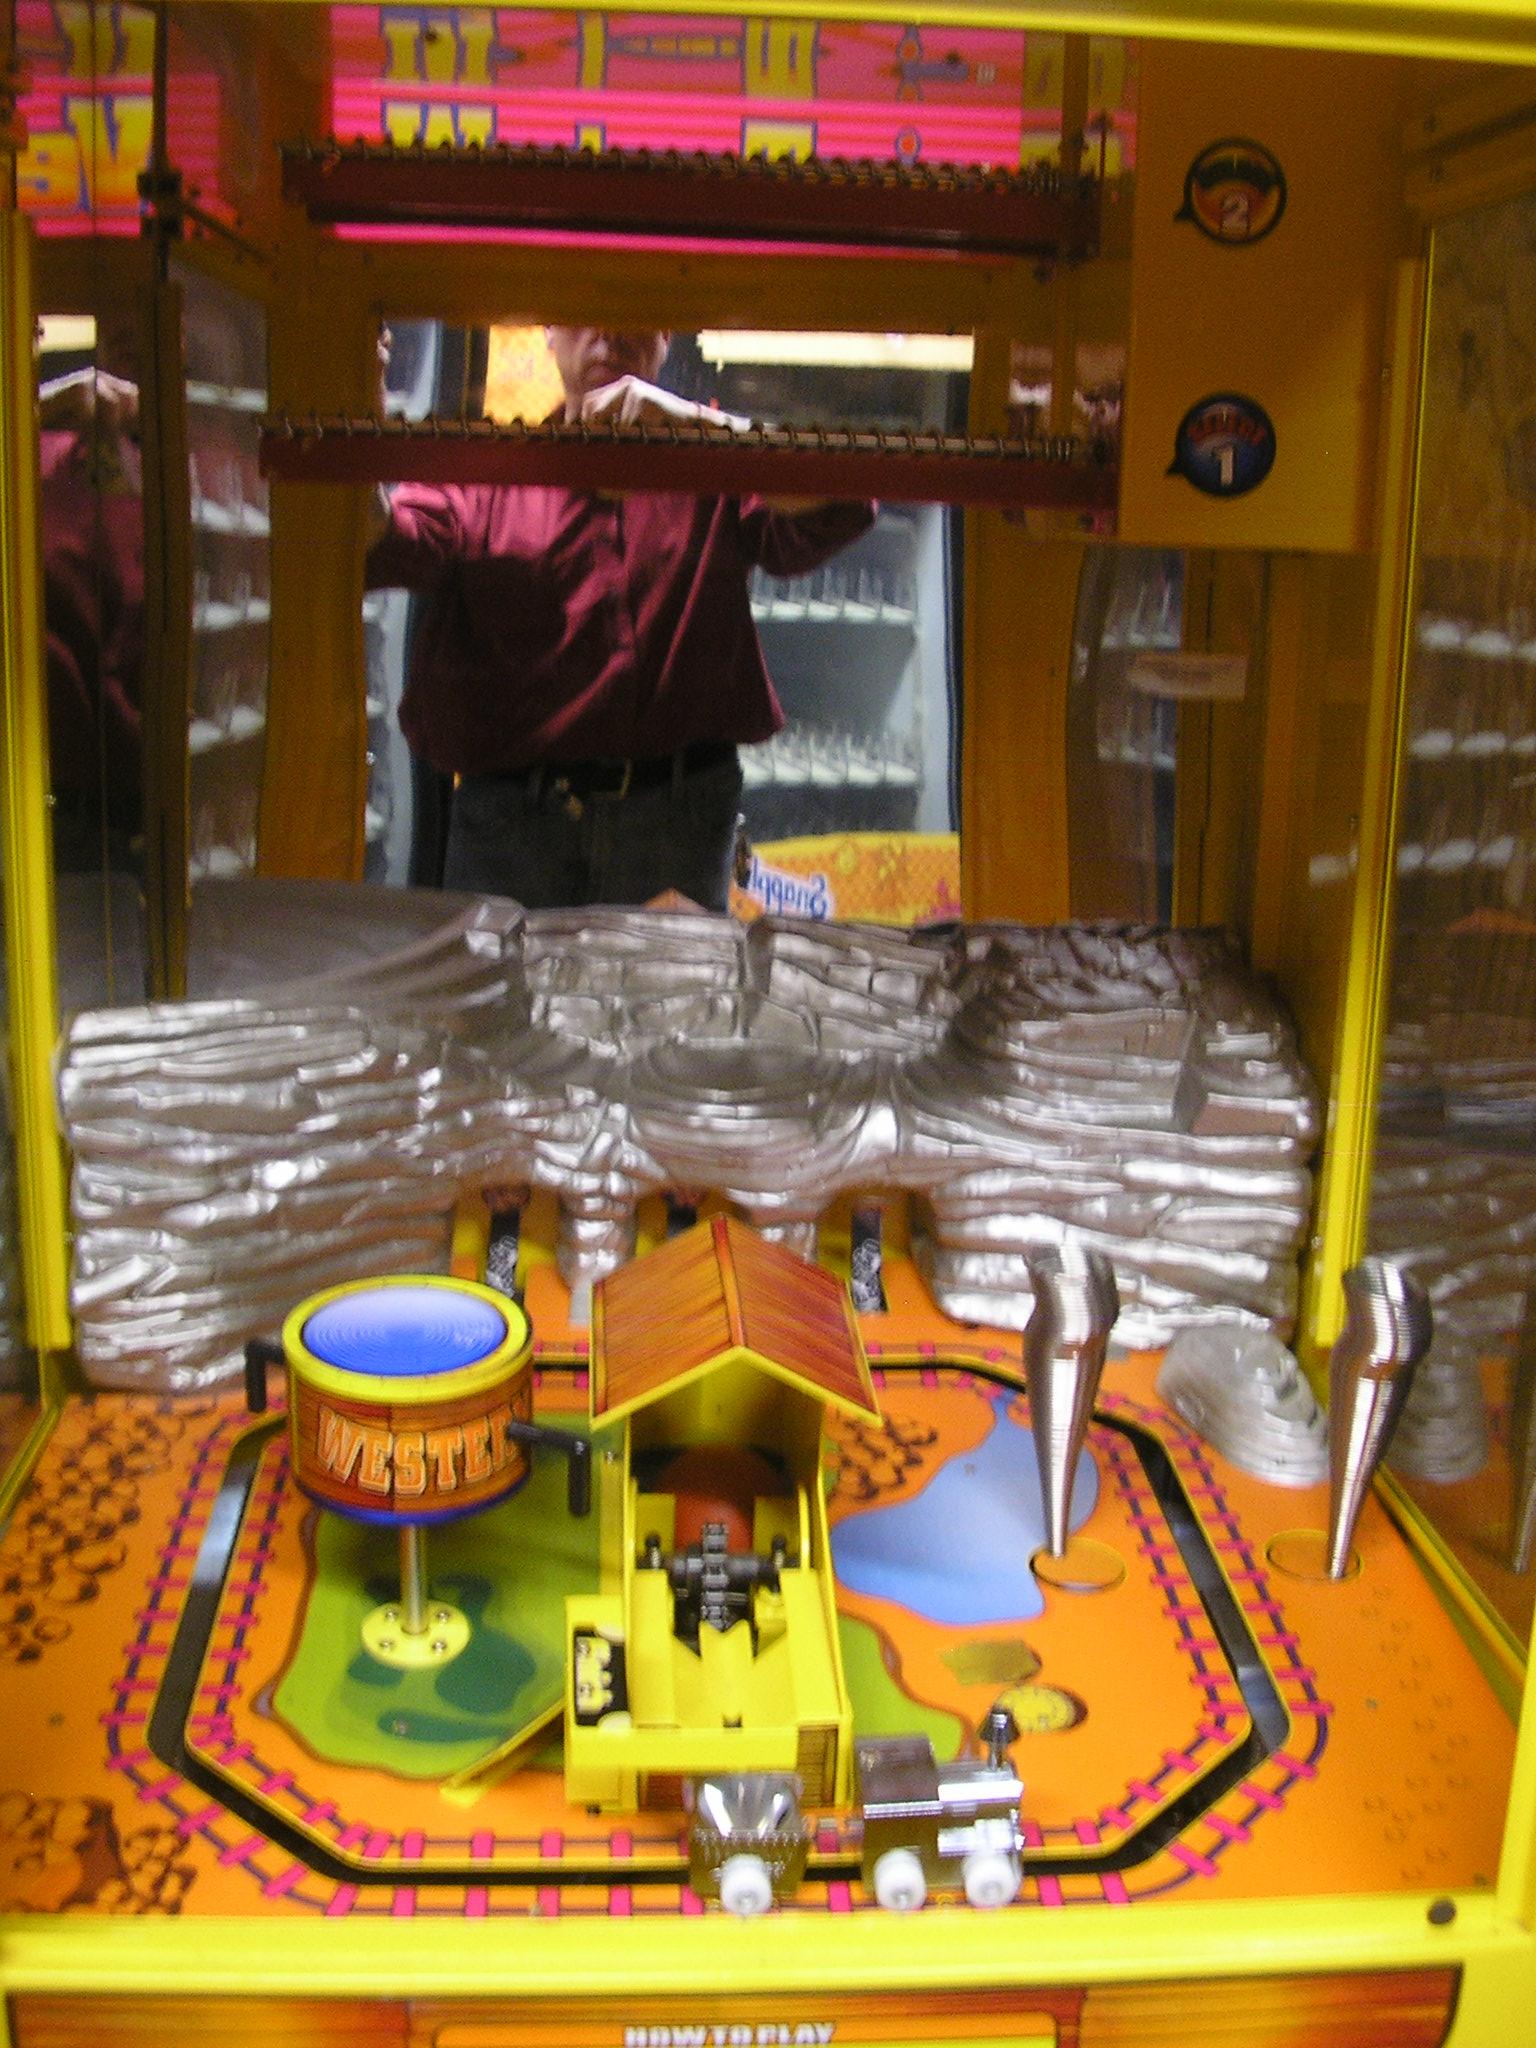 Western Train Candy Crane Arcade Machine Game For Sale